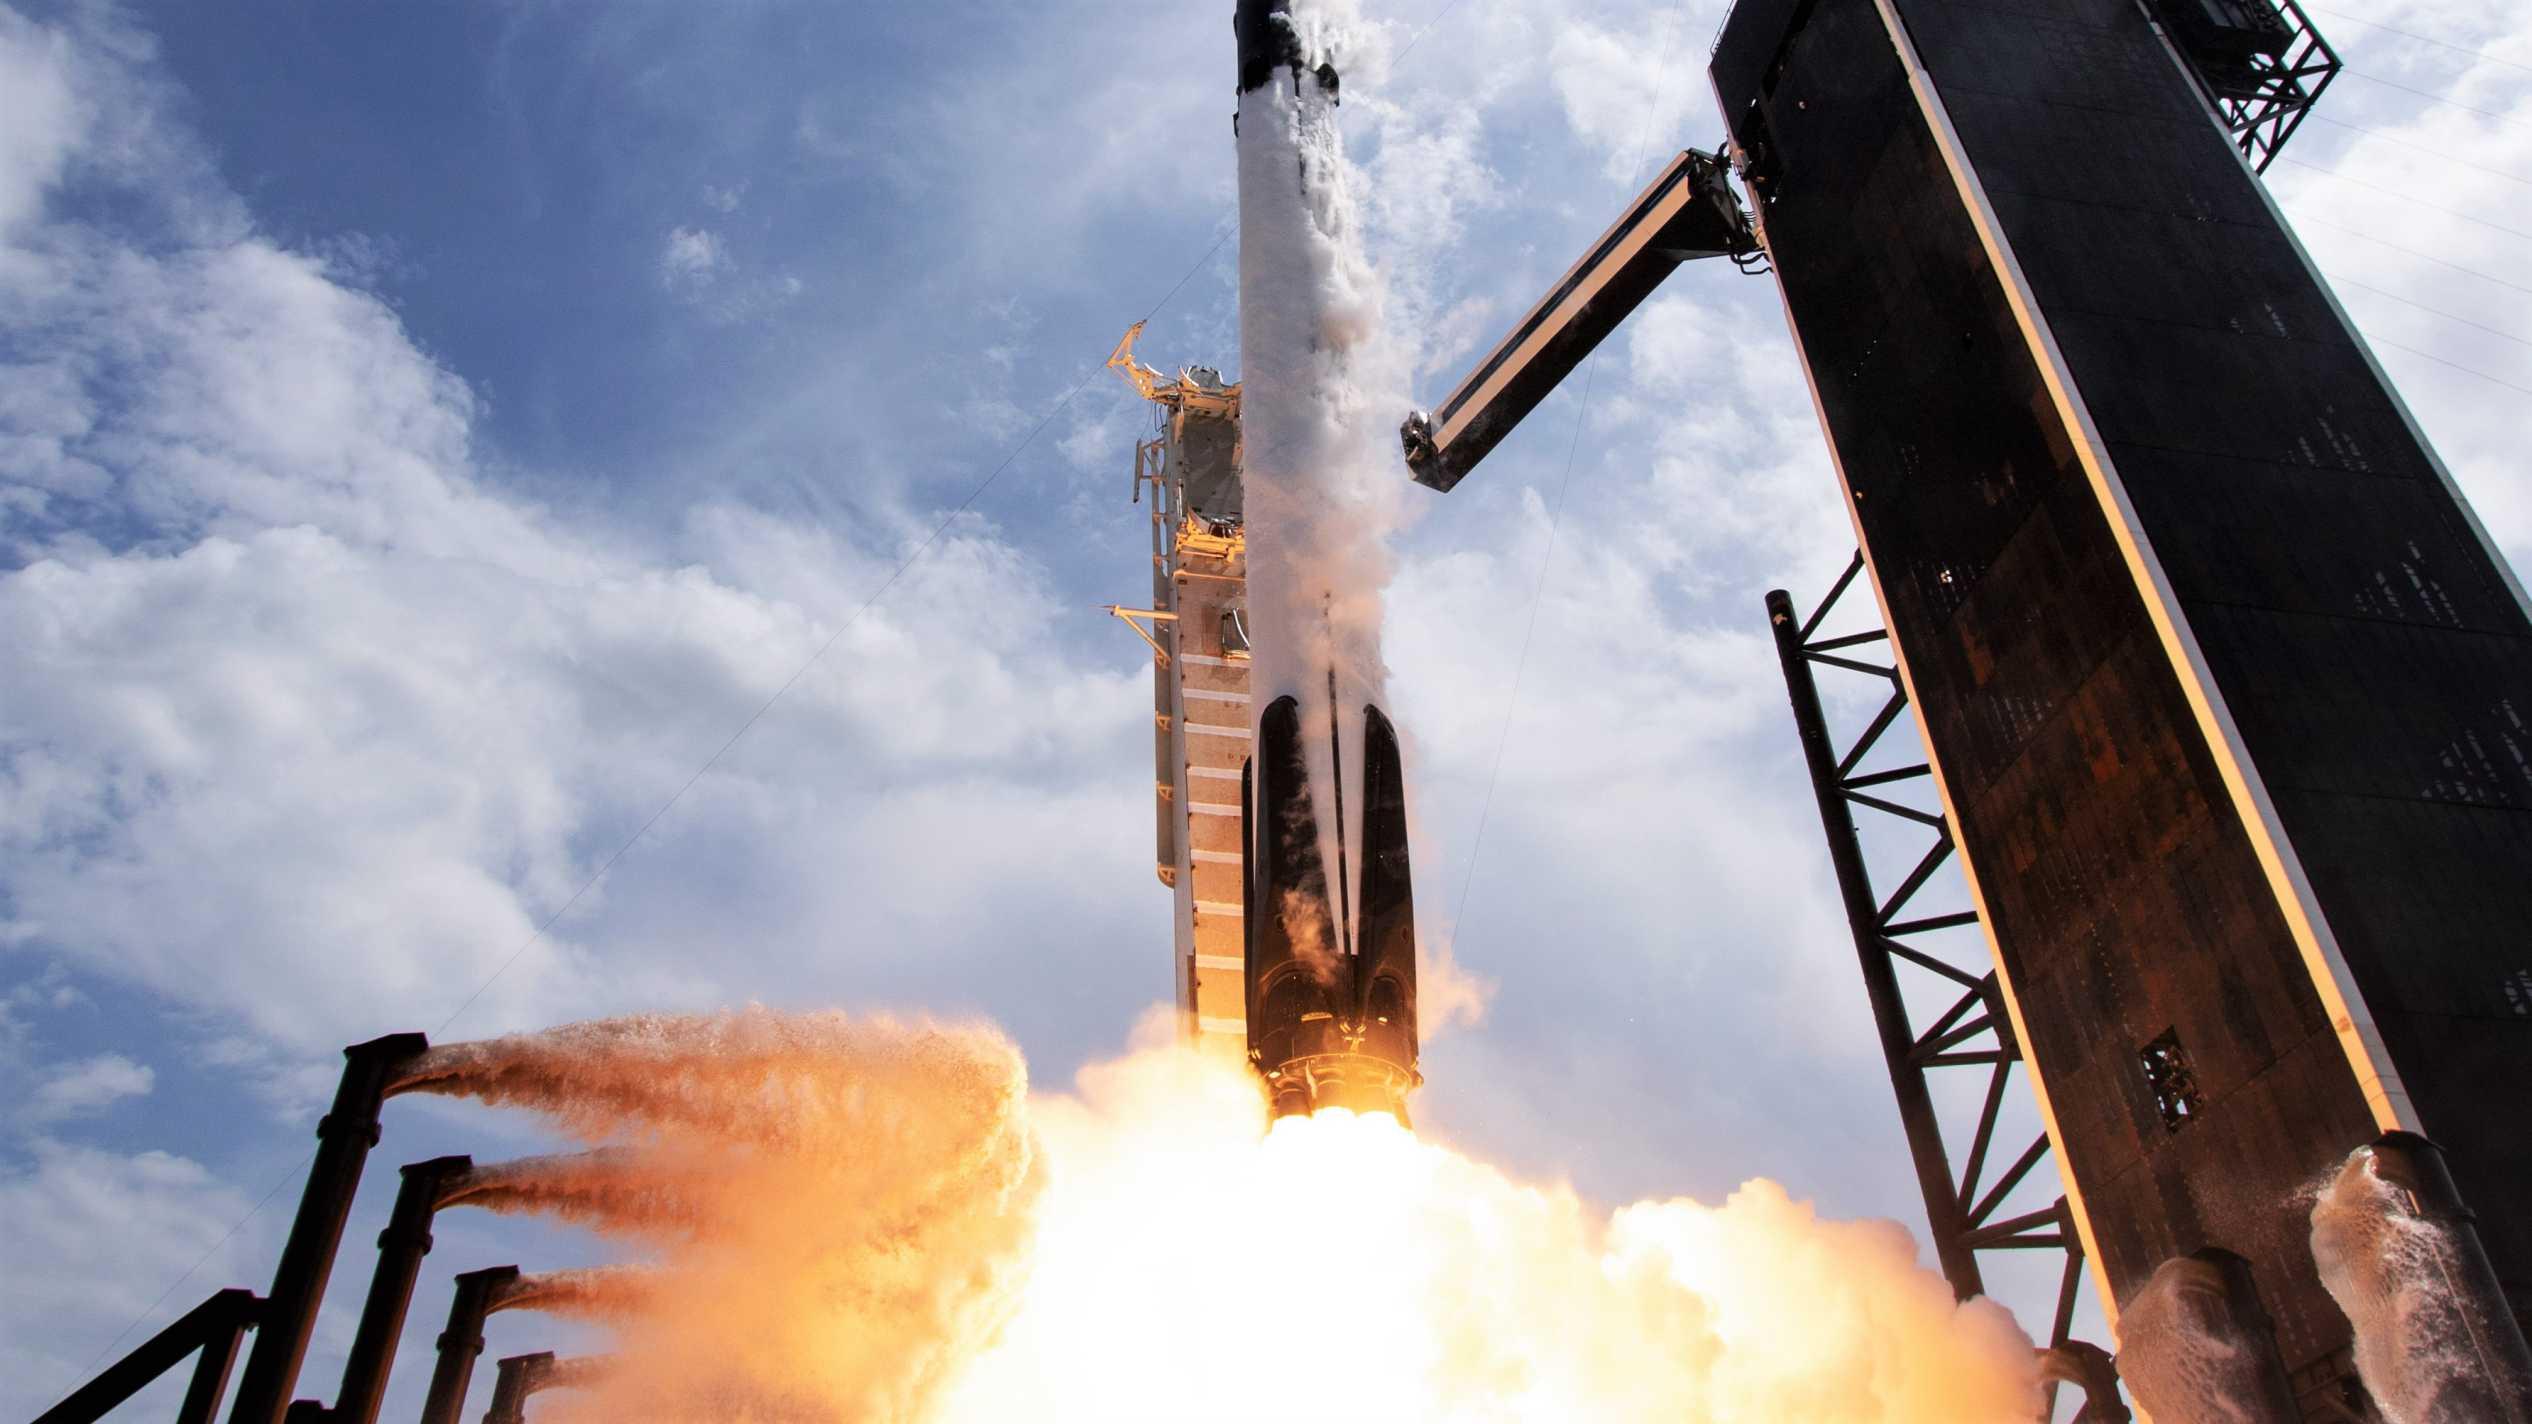 Crew Dragon C206 F9 B1058 Demo-2 39A 053020 (NASA) launch 28 crop (c)